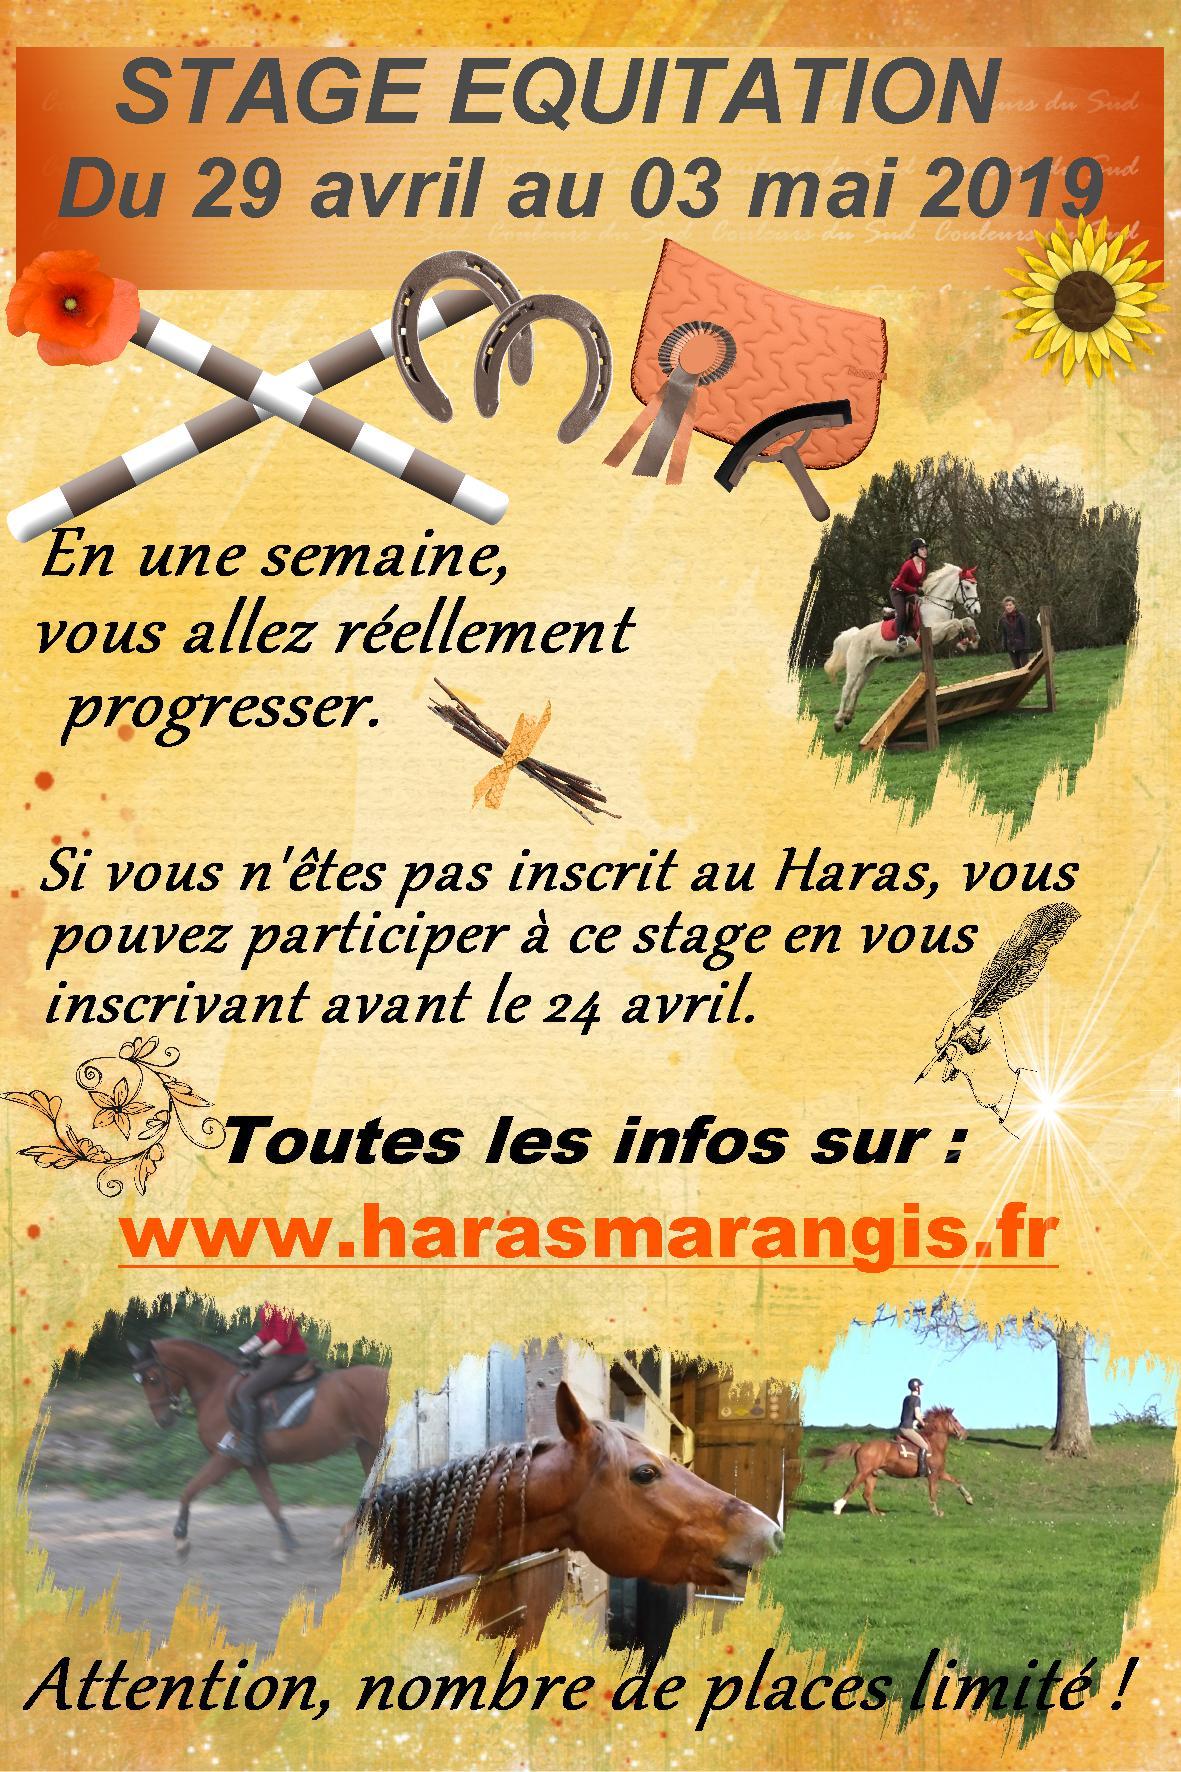 Stage équitation - avril 2019